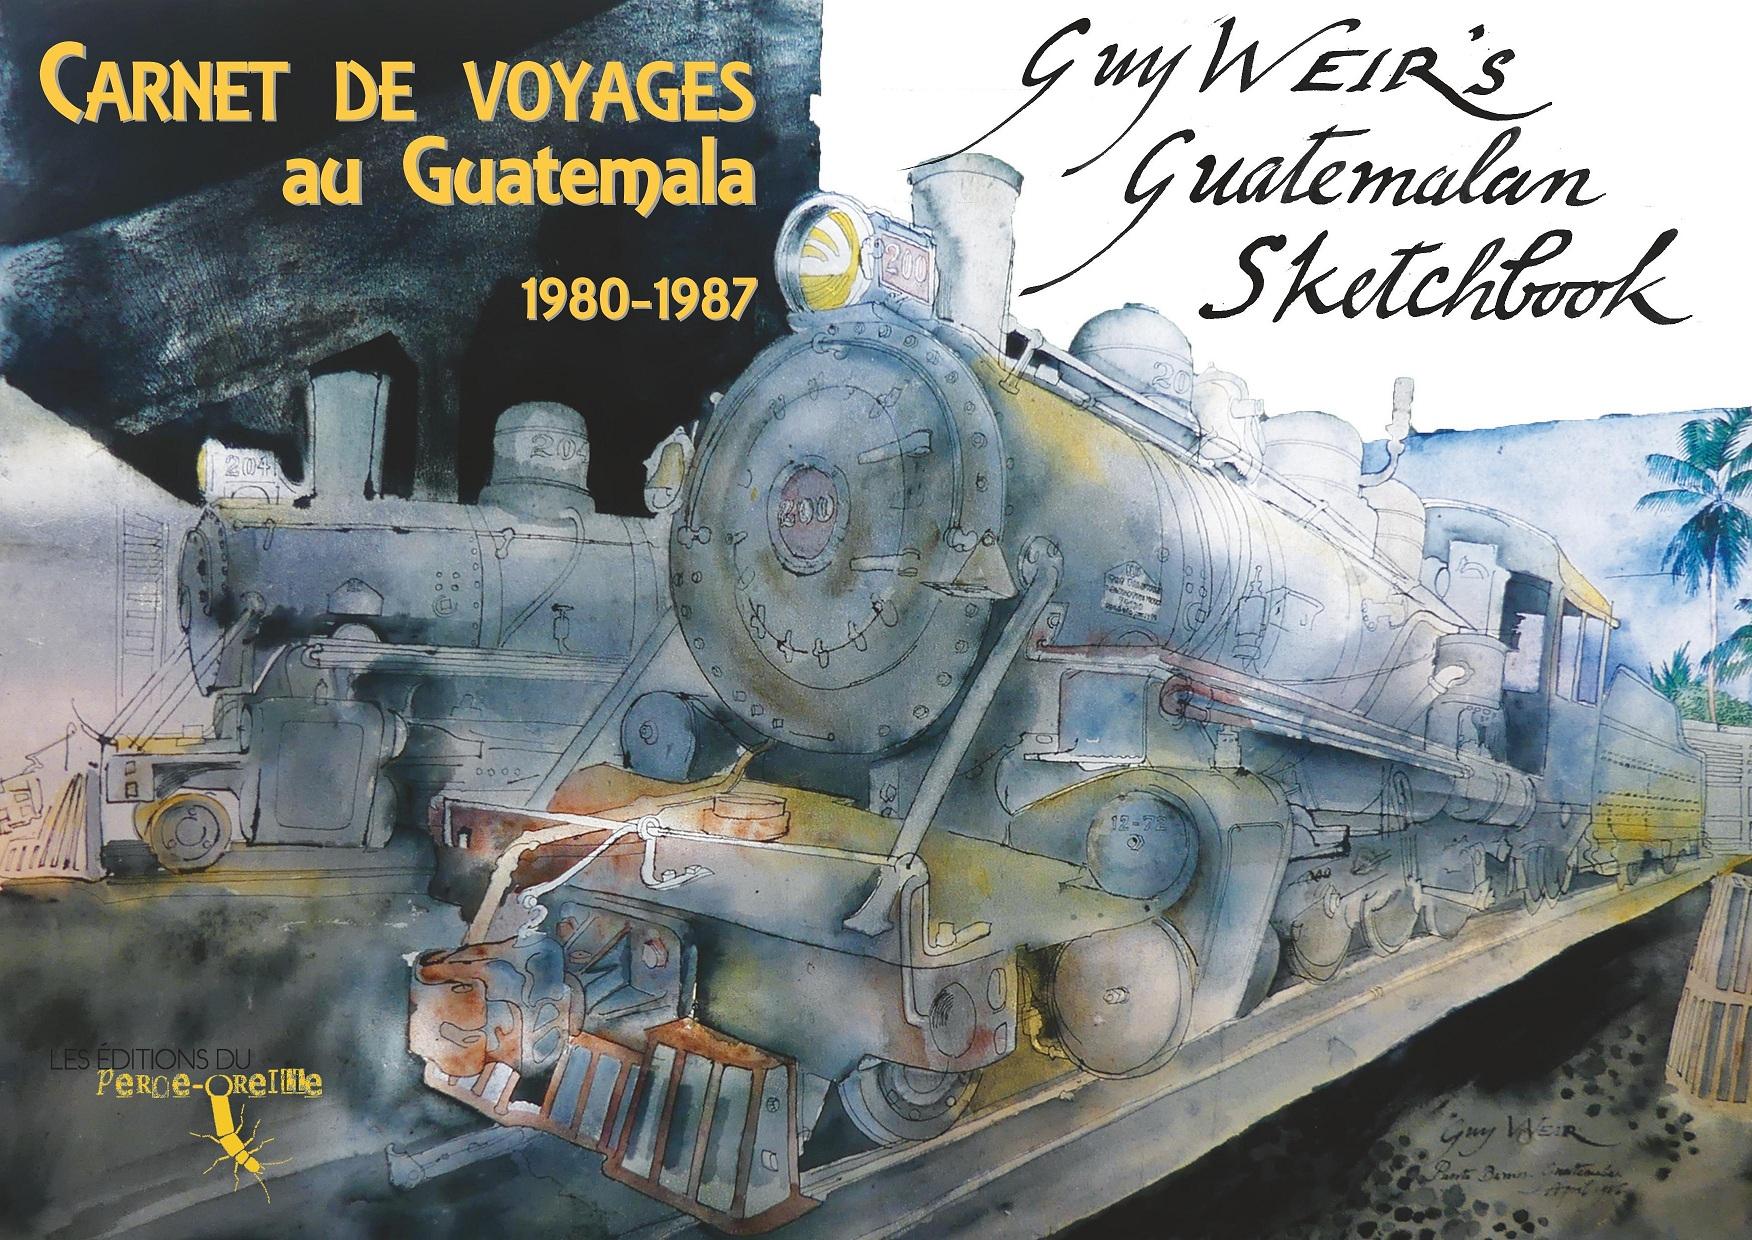 Carnet de voyages au Guatemal / Guy Weir's Guatemalan sketchbook